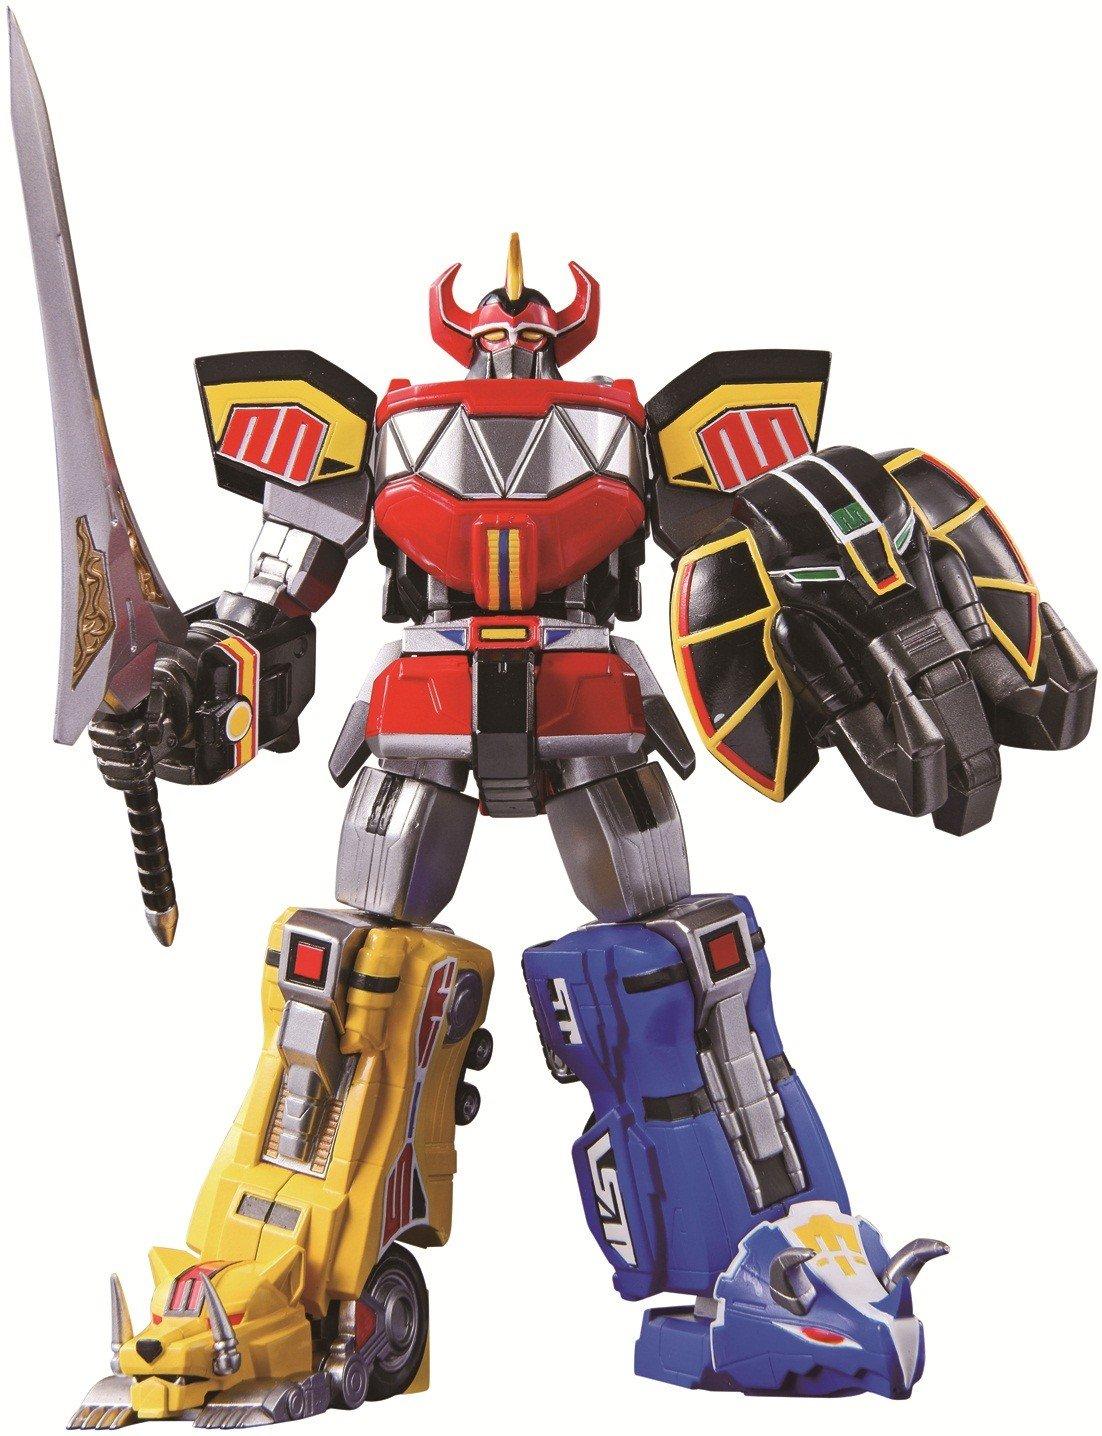 Bandai Tamashii Nations Super Robot Chogokin Megazord Mighty Morphin Power Power Power Rangers (japan import) a73f23